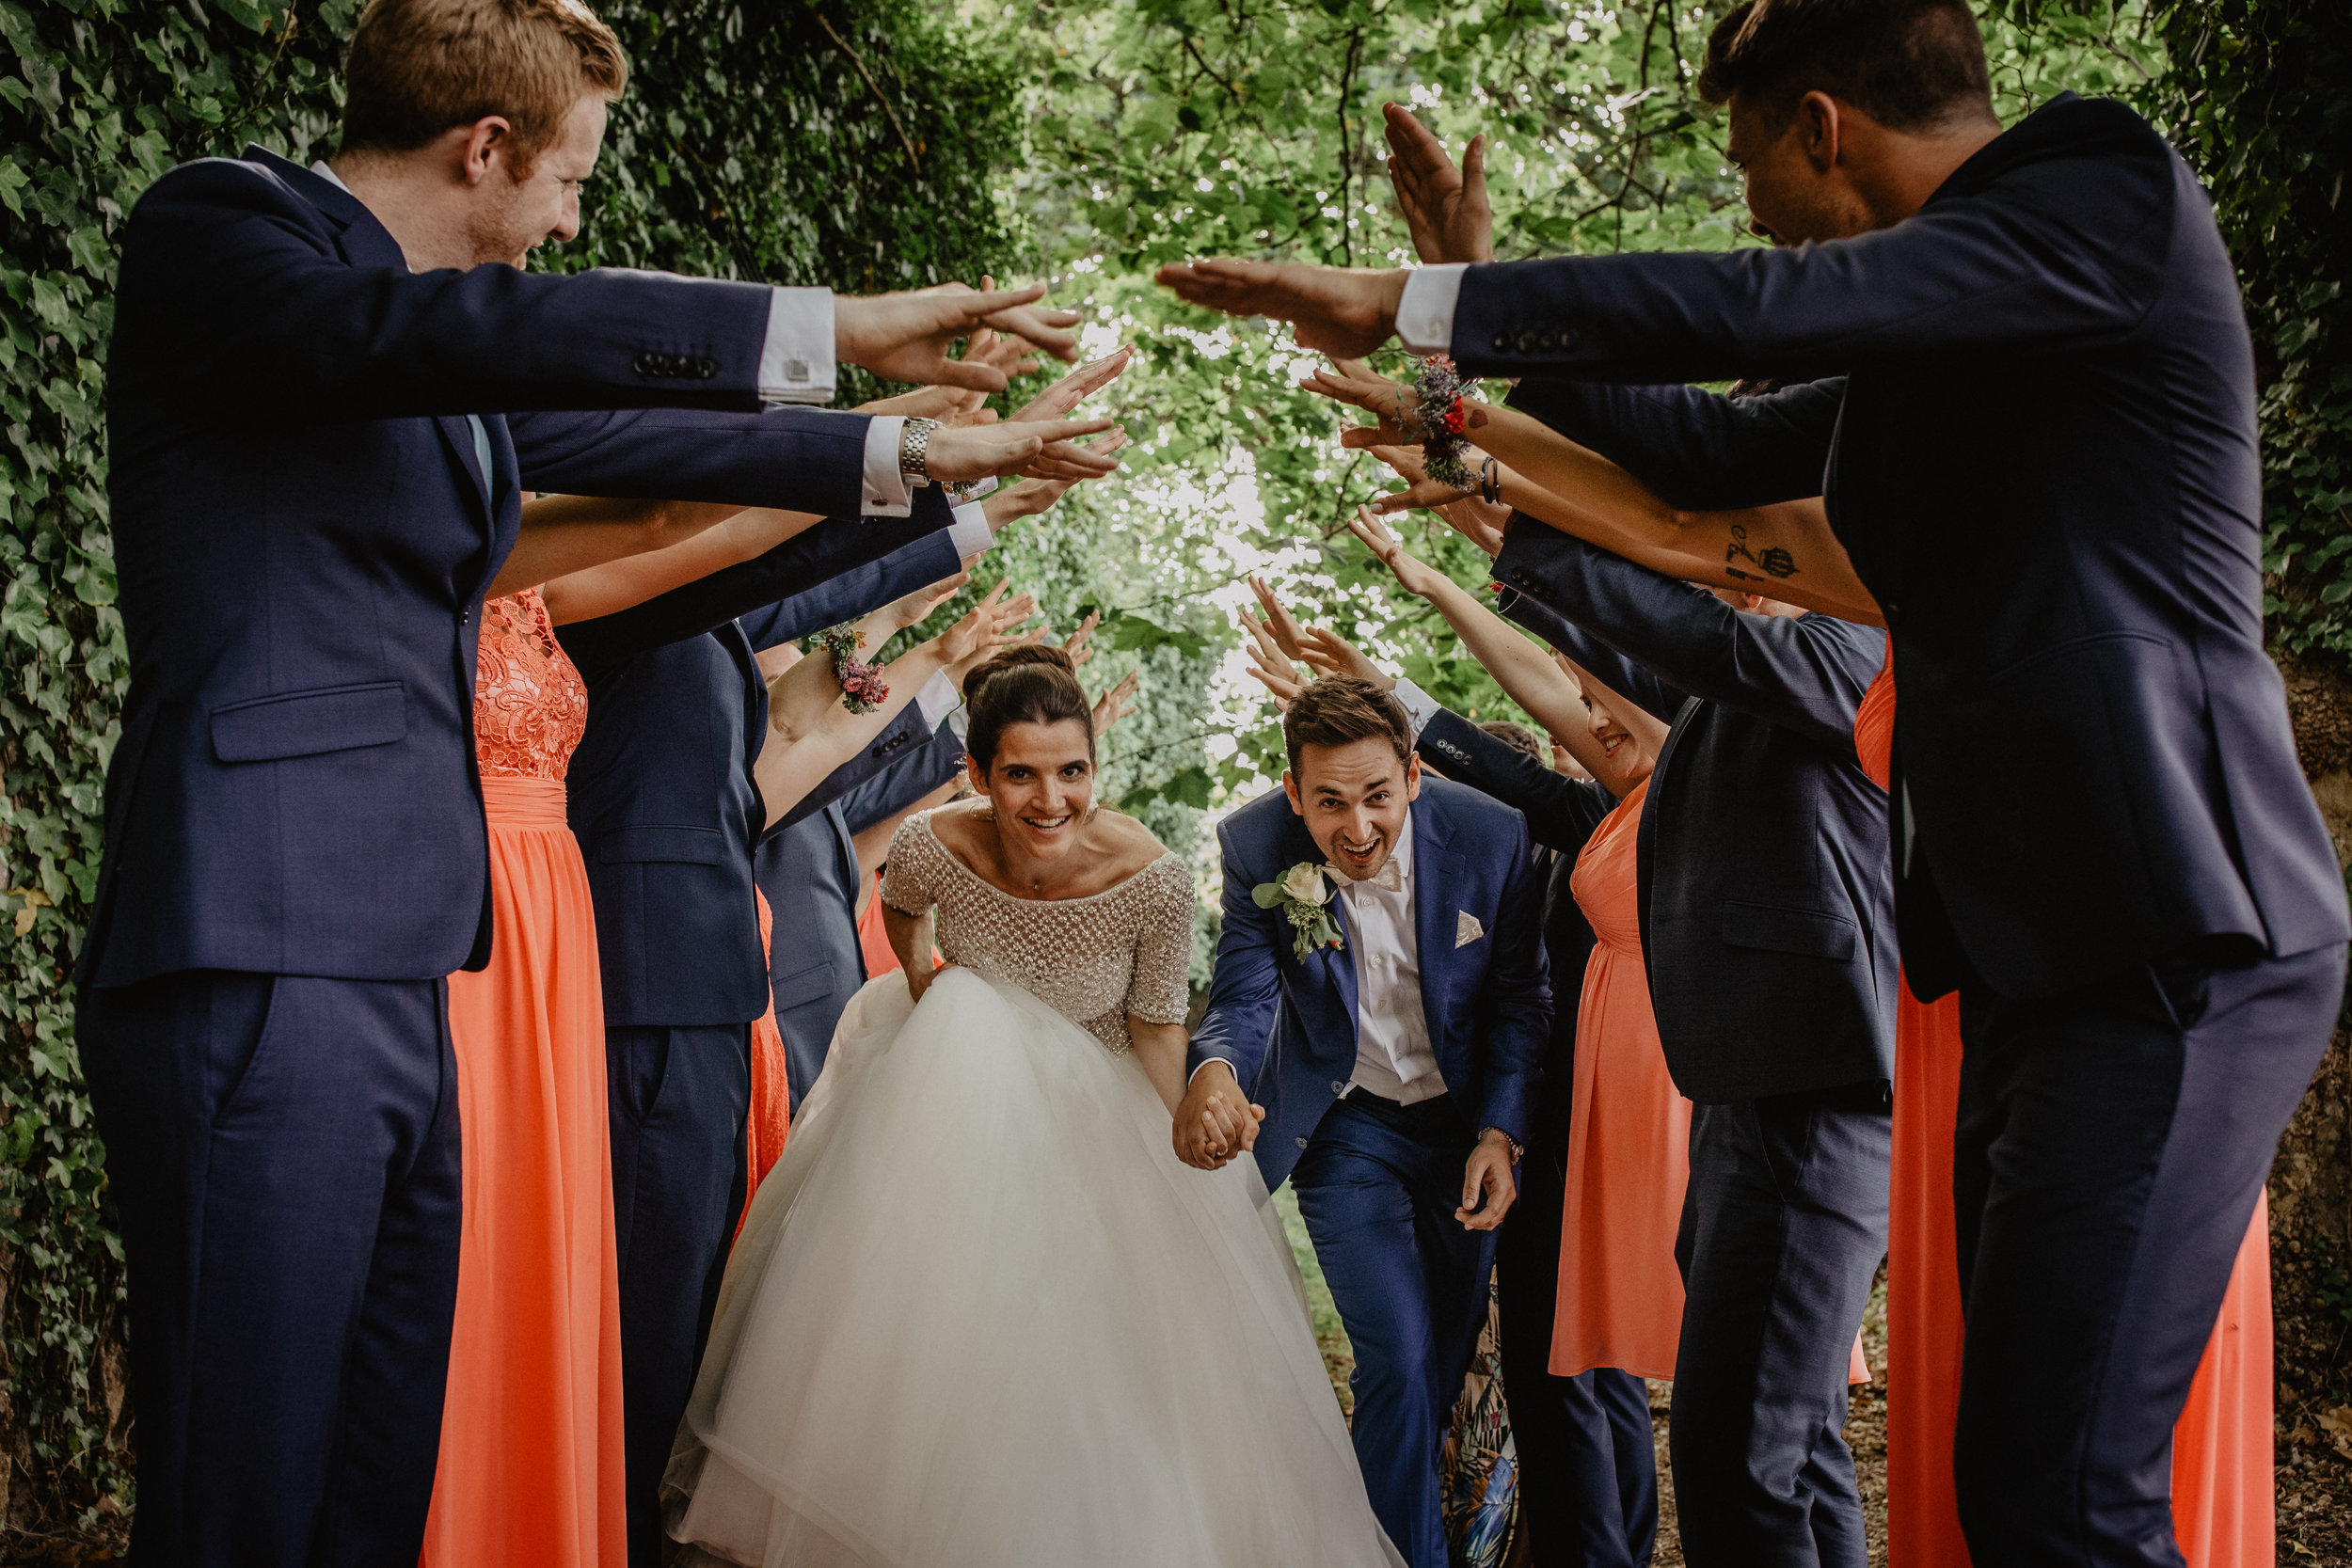 Lapela-photography-wedding-sintra-portugal-81.jpg